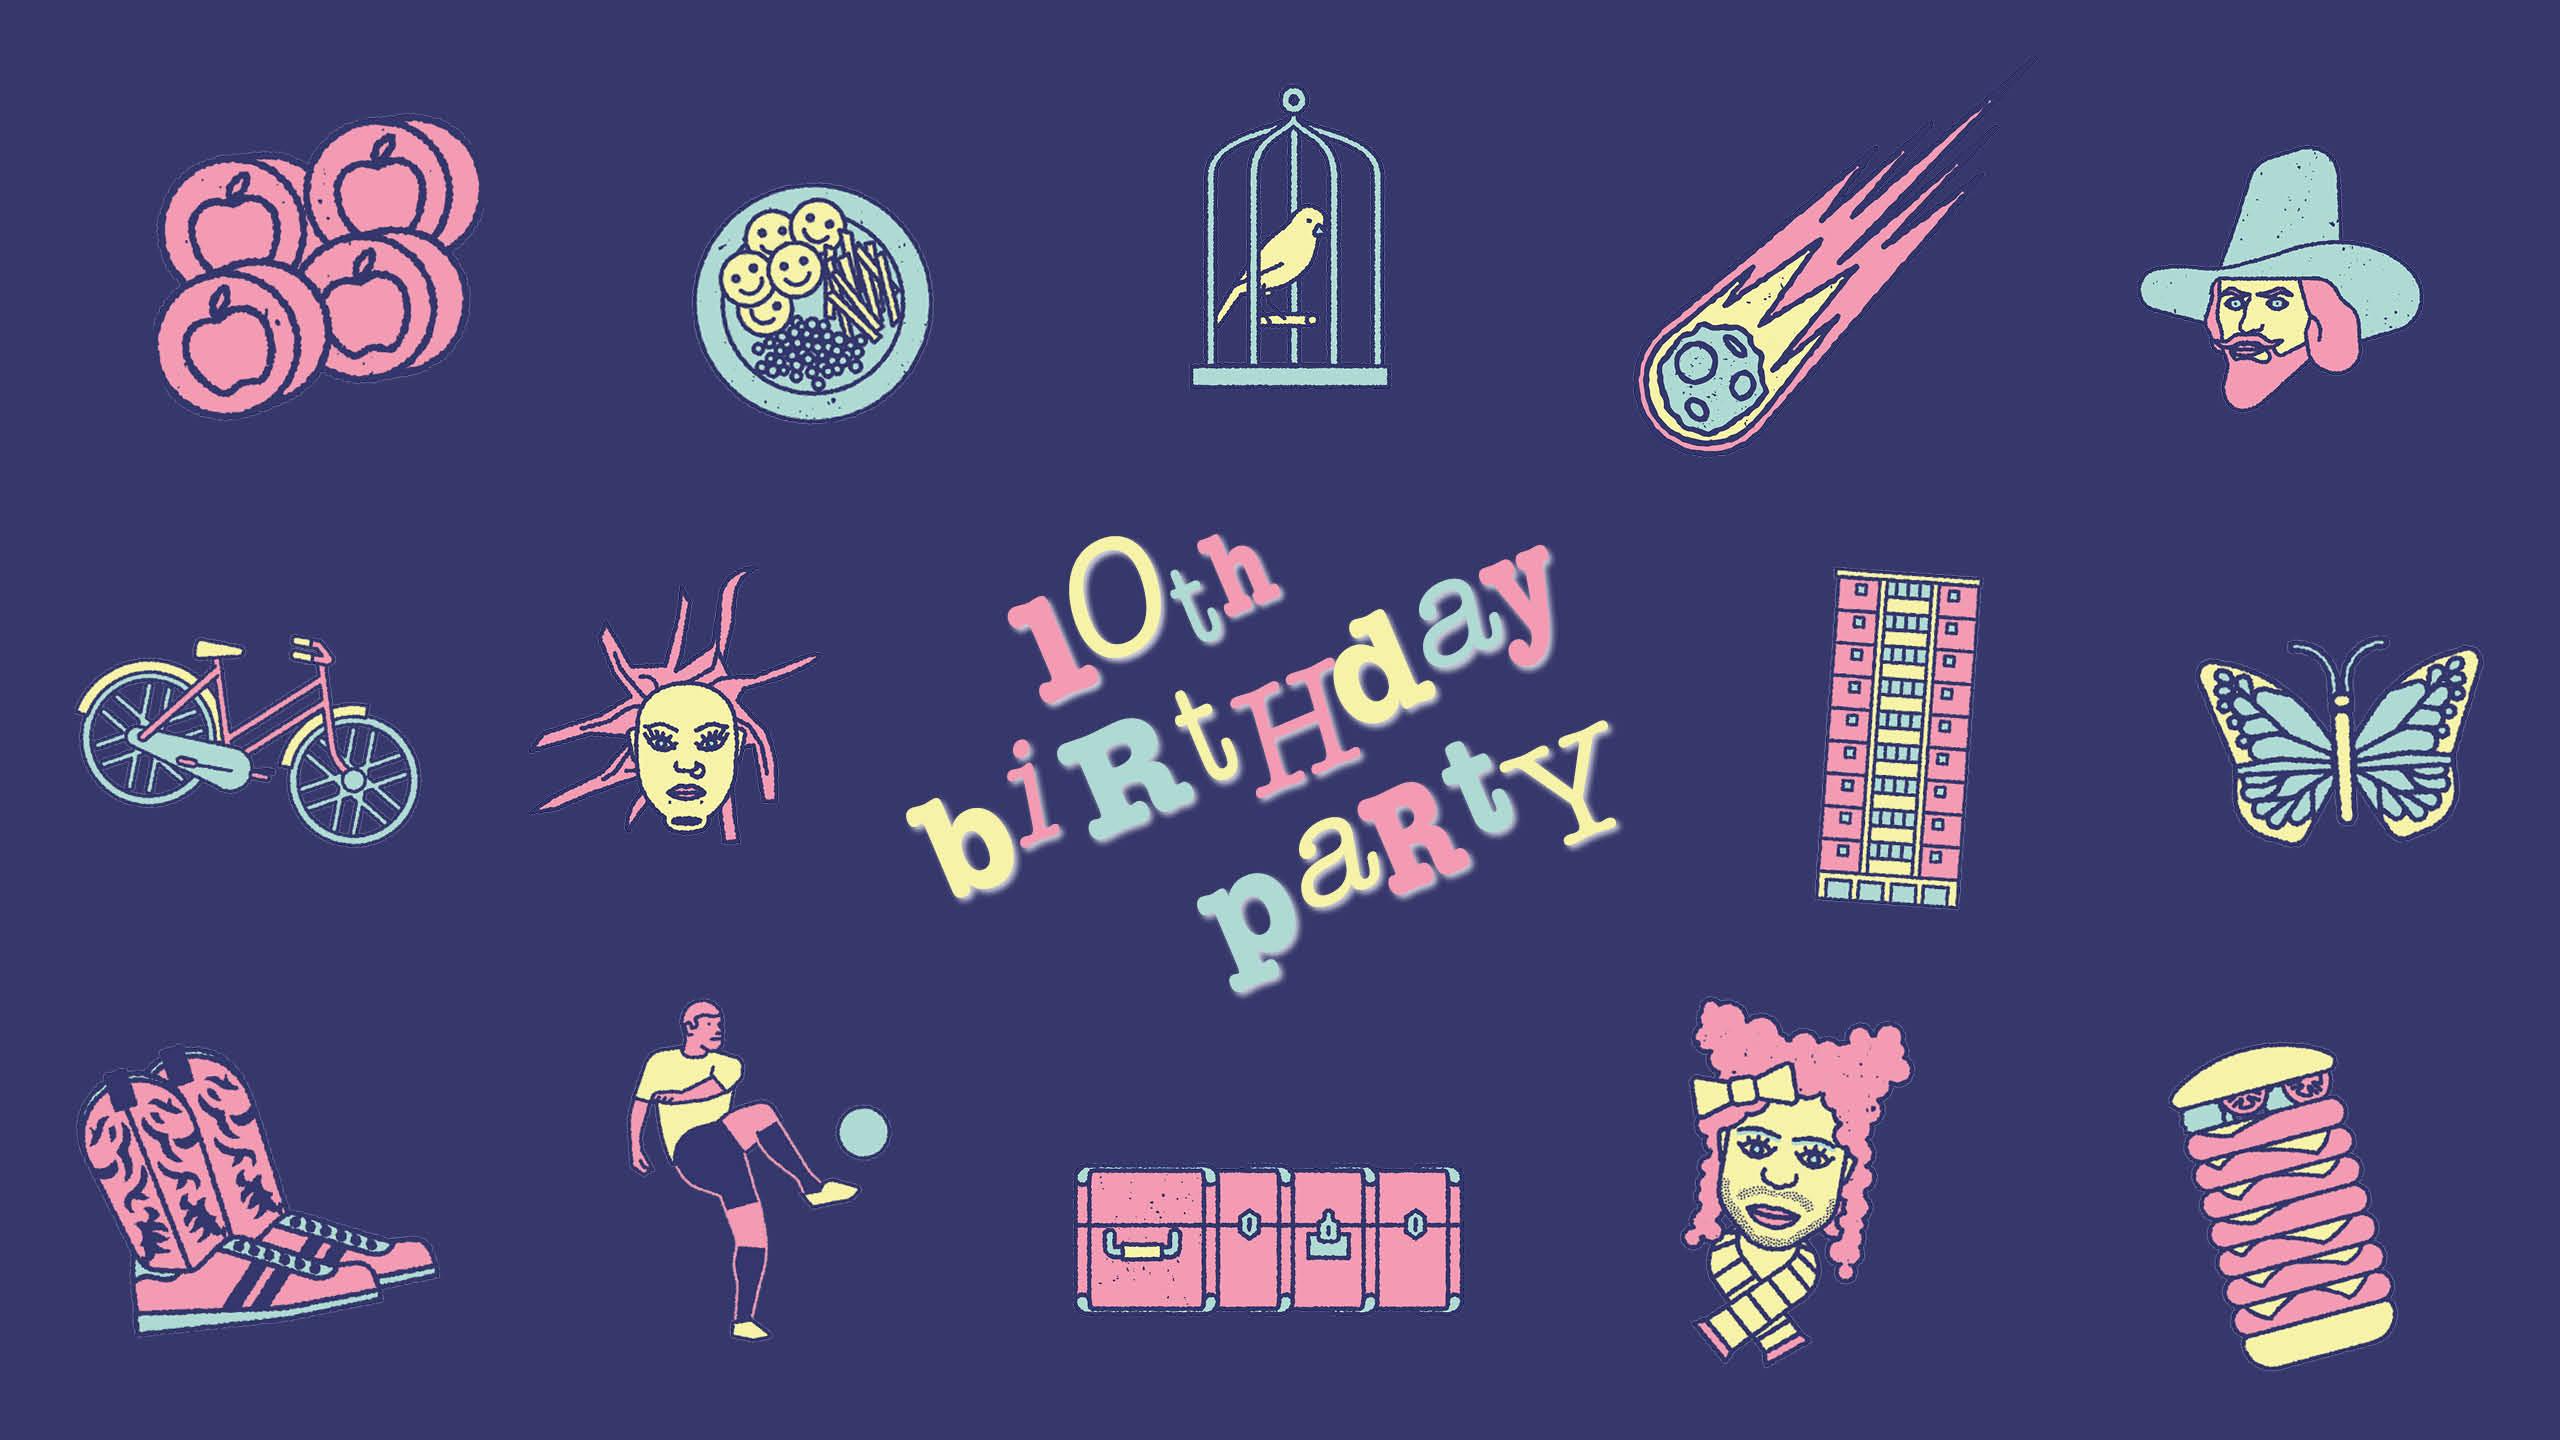 10th Birthday Party artwork